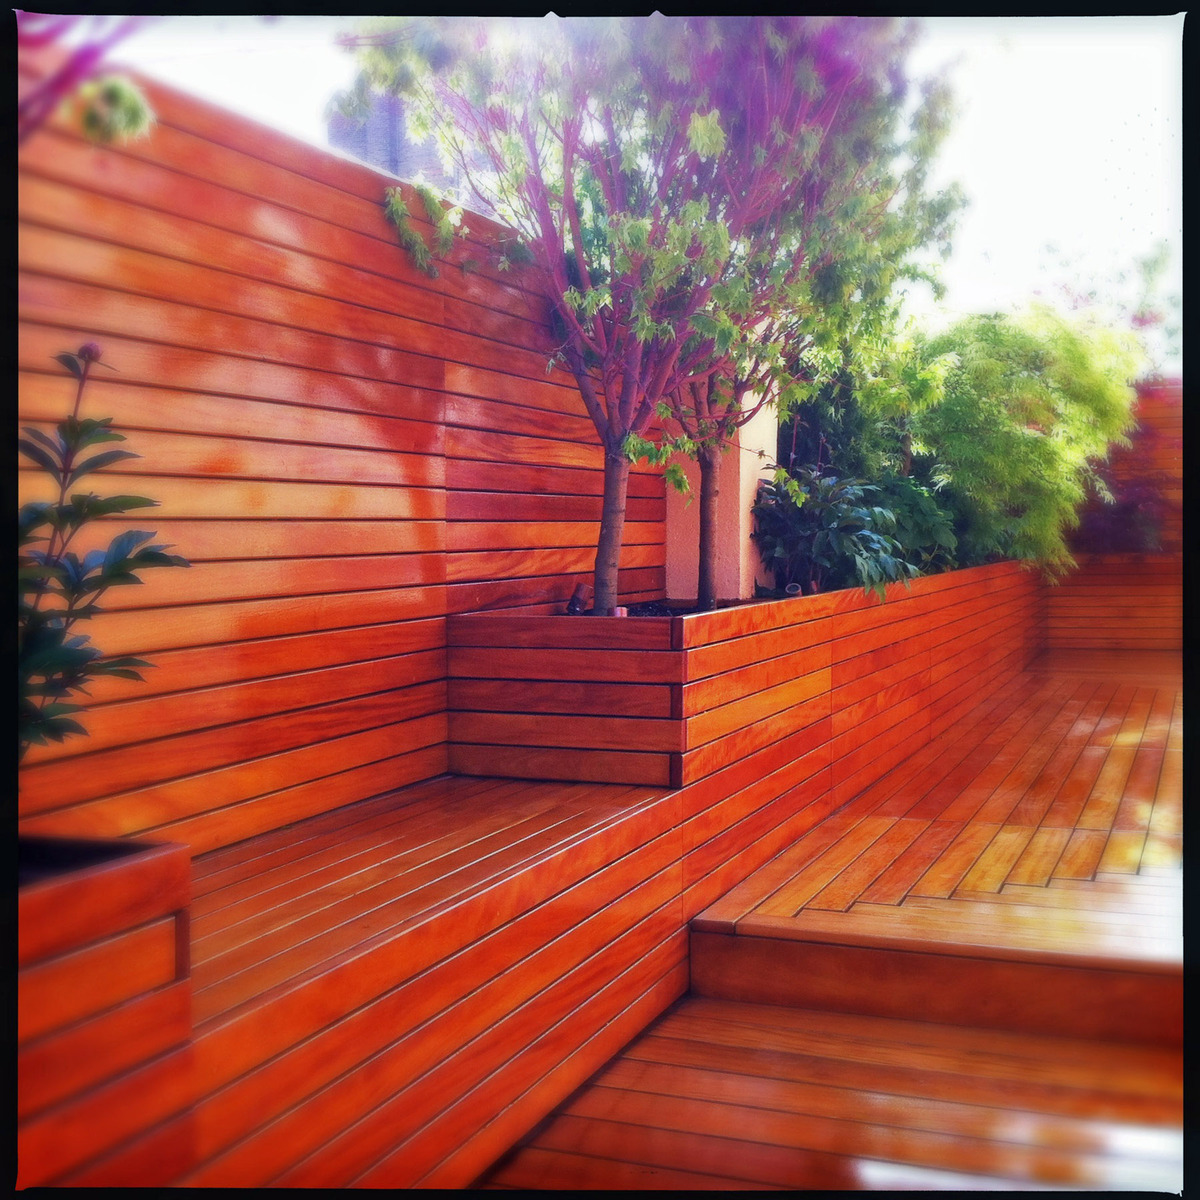 Nyc garden design rooftop zen garden for yoga studio for Garden design jobs nyc